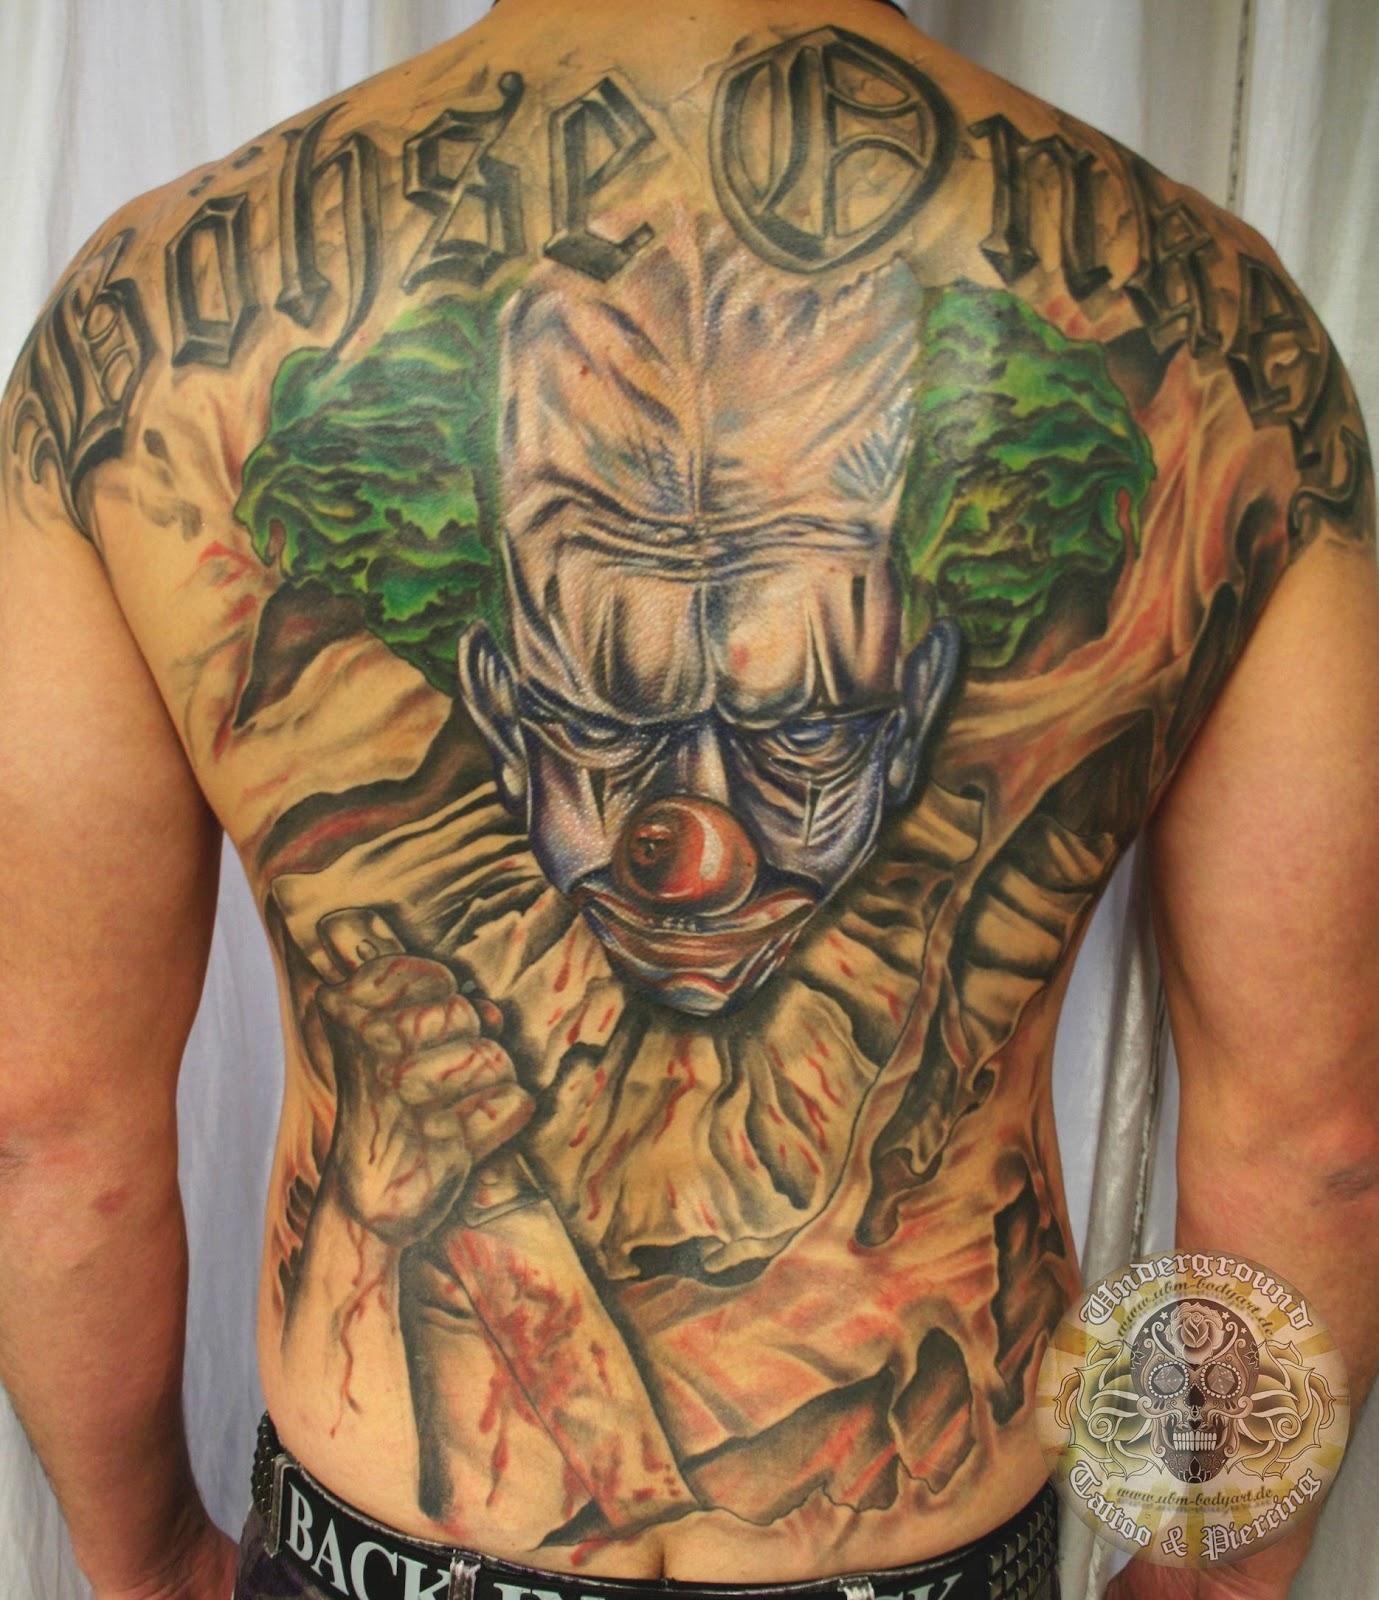 http://2.bp.blogspot.com/-PadWtfOaKR8/UBvpenWSn0I/AAAAAAAADc0/bFmJkYVq0gA/s1600/Tattoo-chicano-clown-smile-cry.jpg